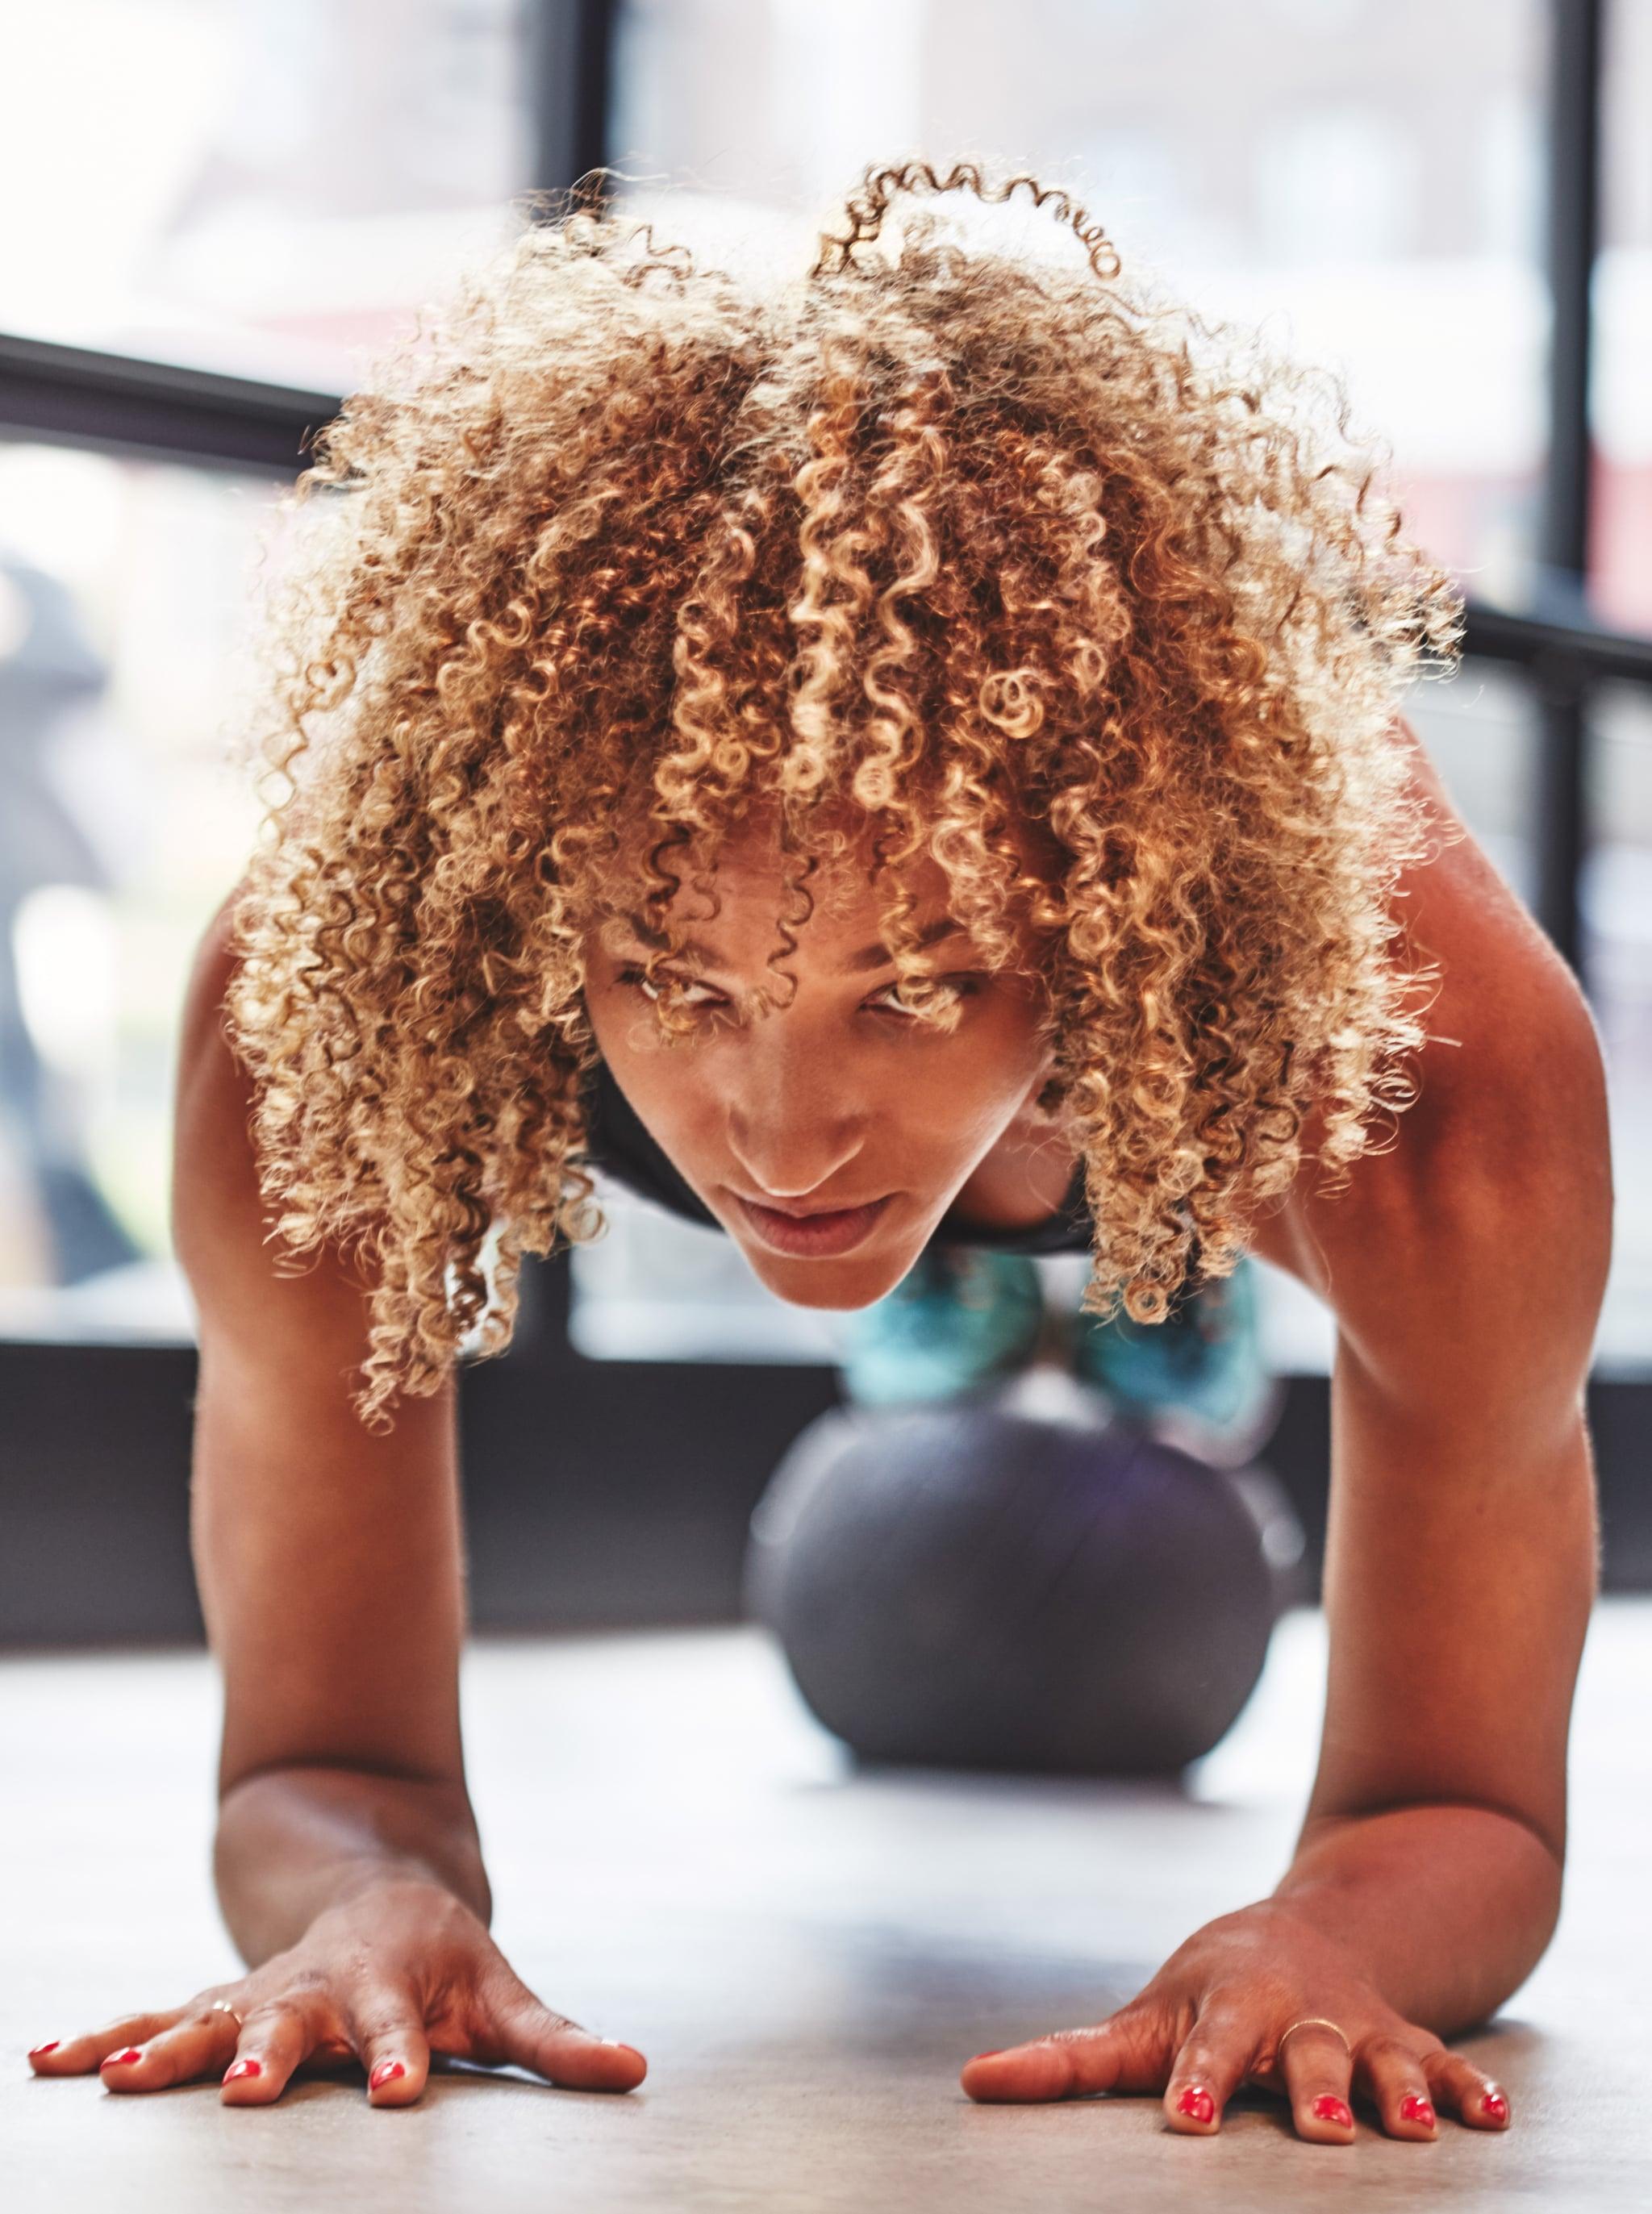 Workouts That Burn 300 Calories | POPSUGAR Fitness